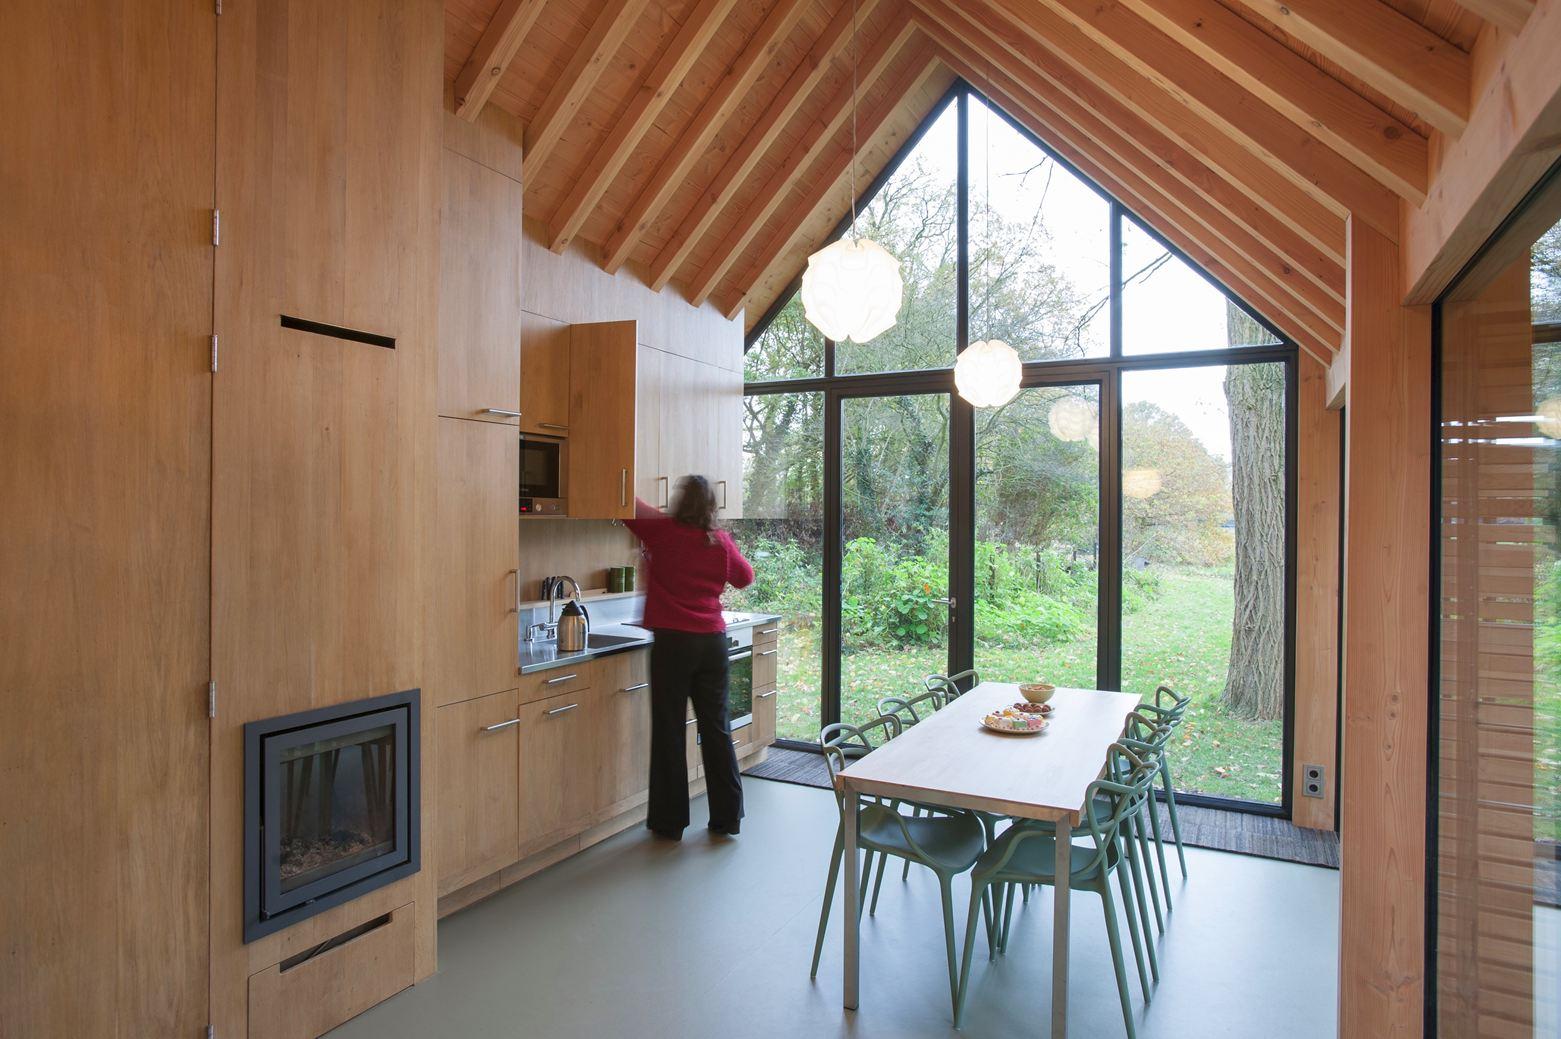 Recreation House in Utrecht, Netherlands by Zecc Architecten